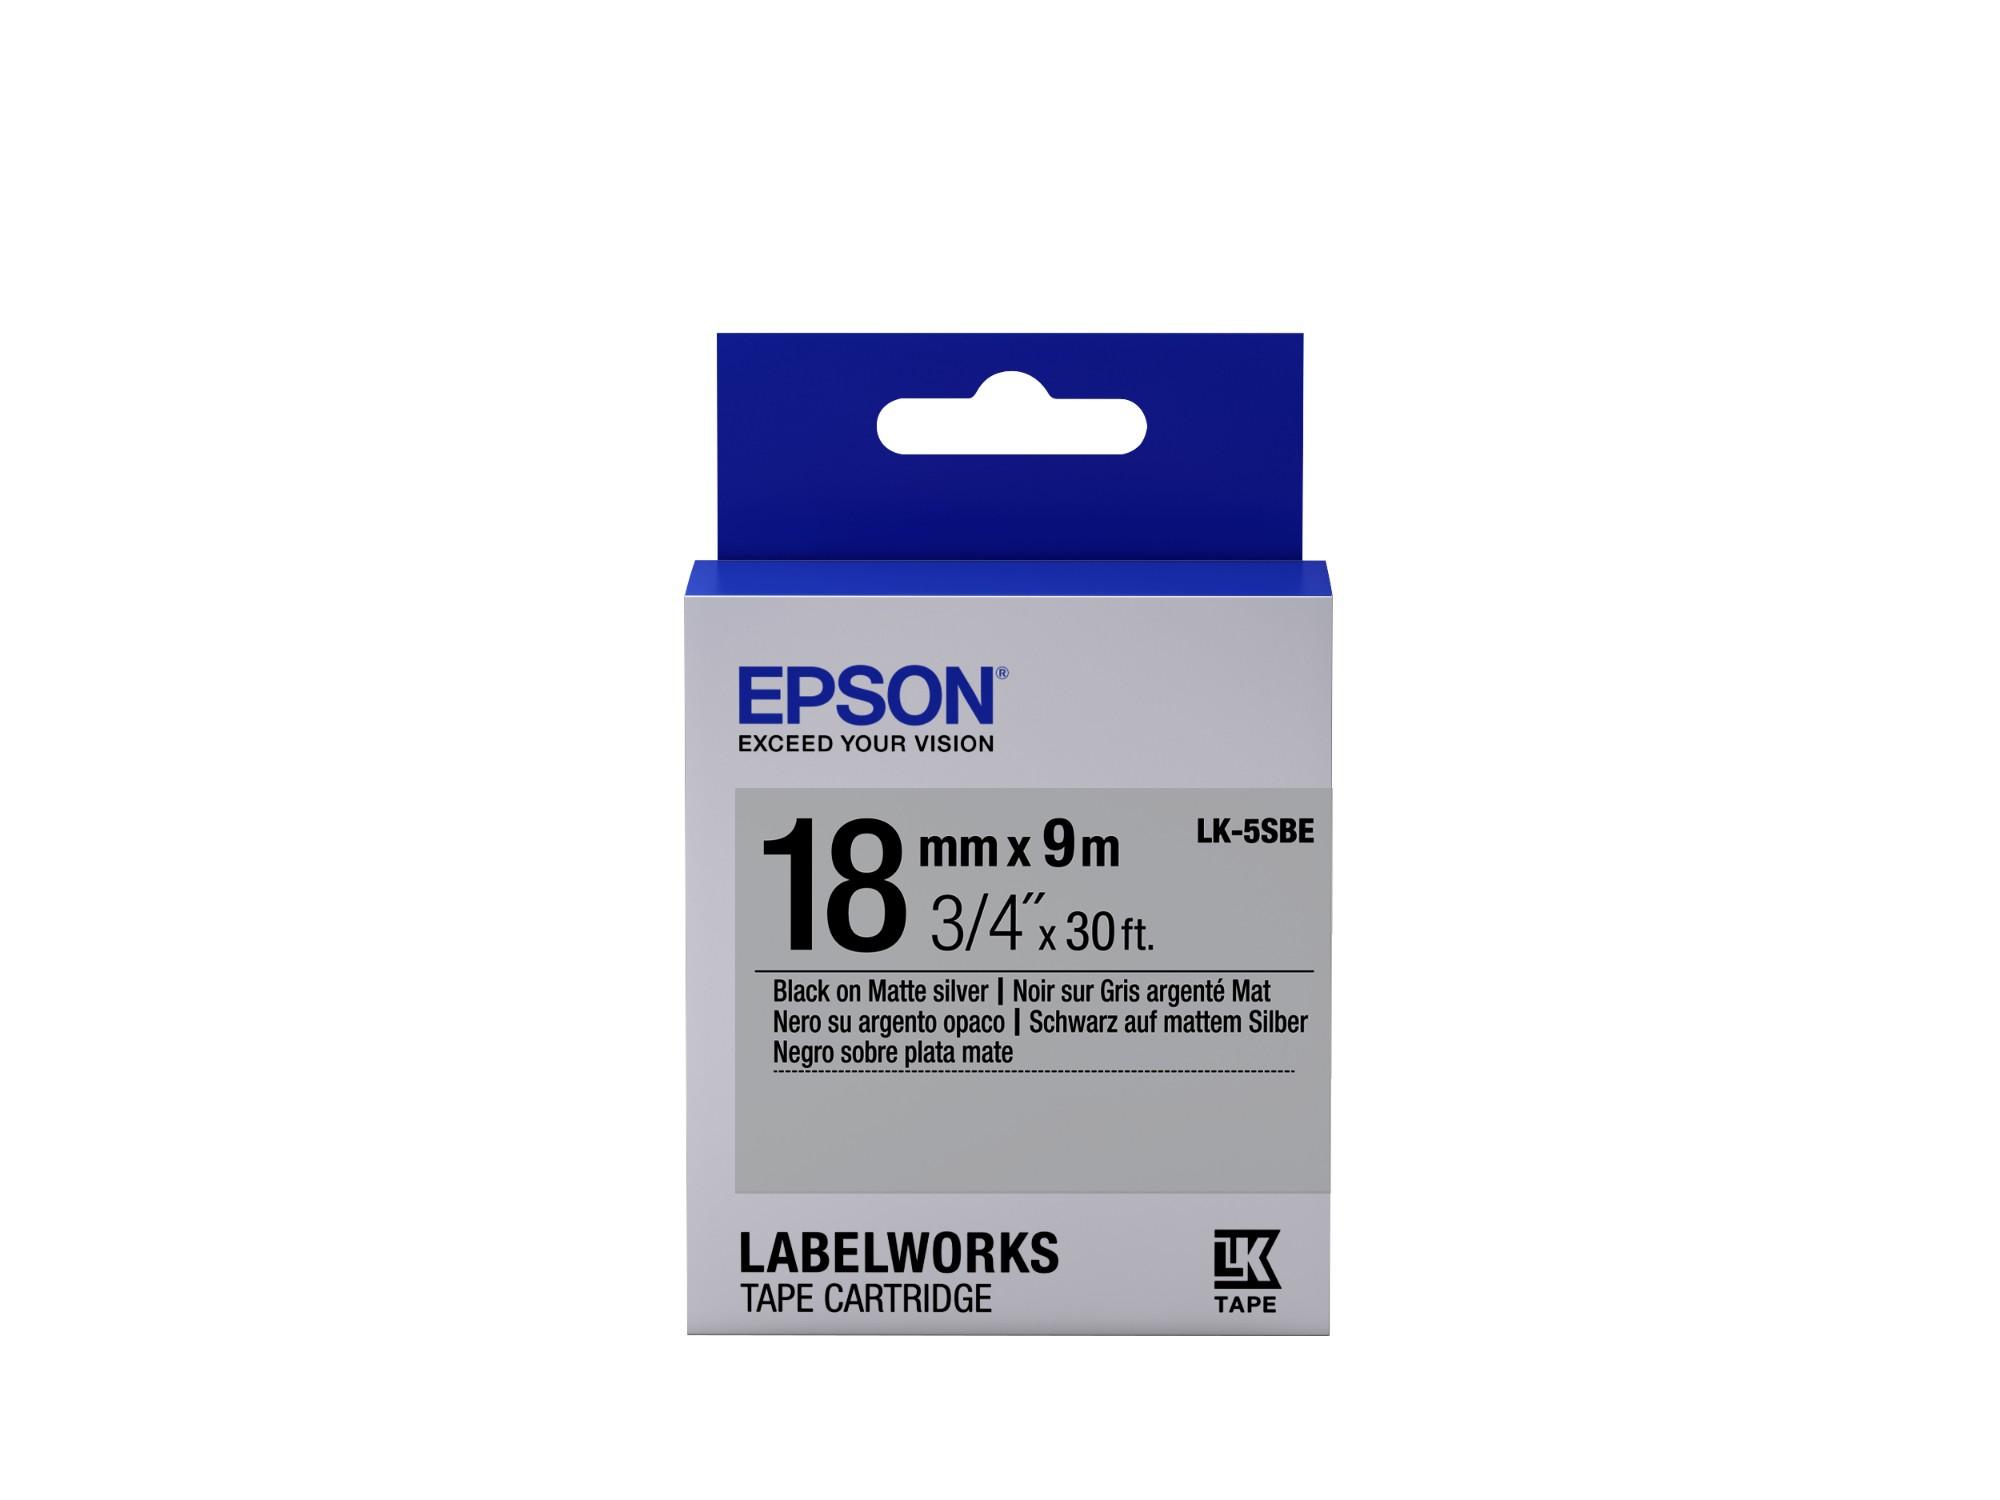 Epson C53S655013 (LK-5SBE) DirectLabel-etikettes, 18mm x 9m